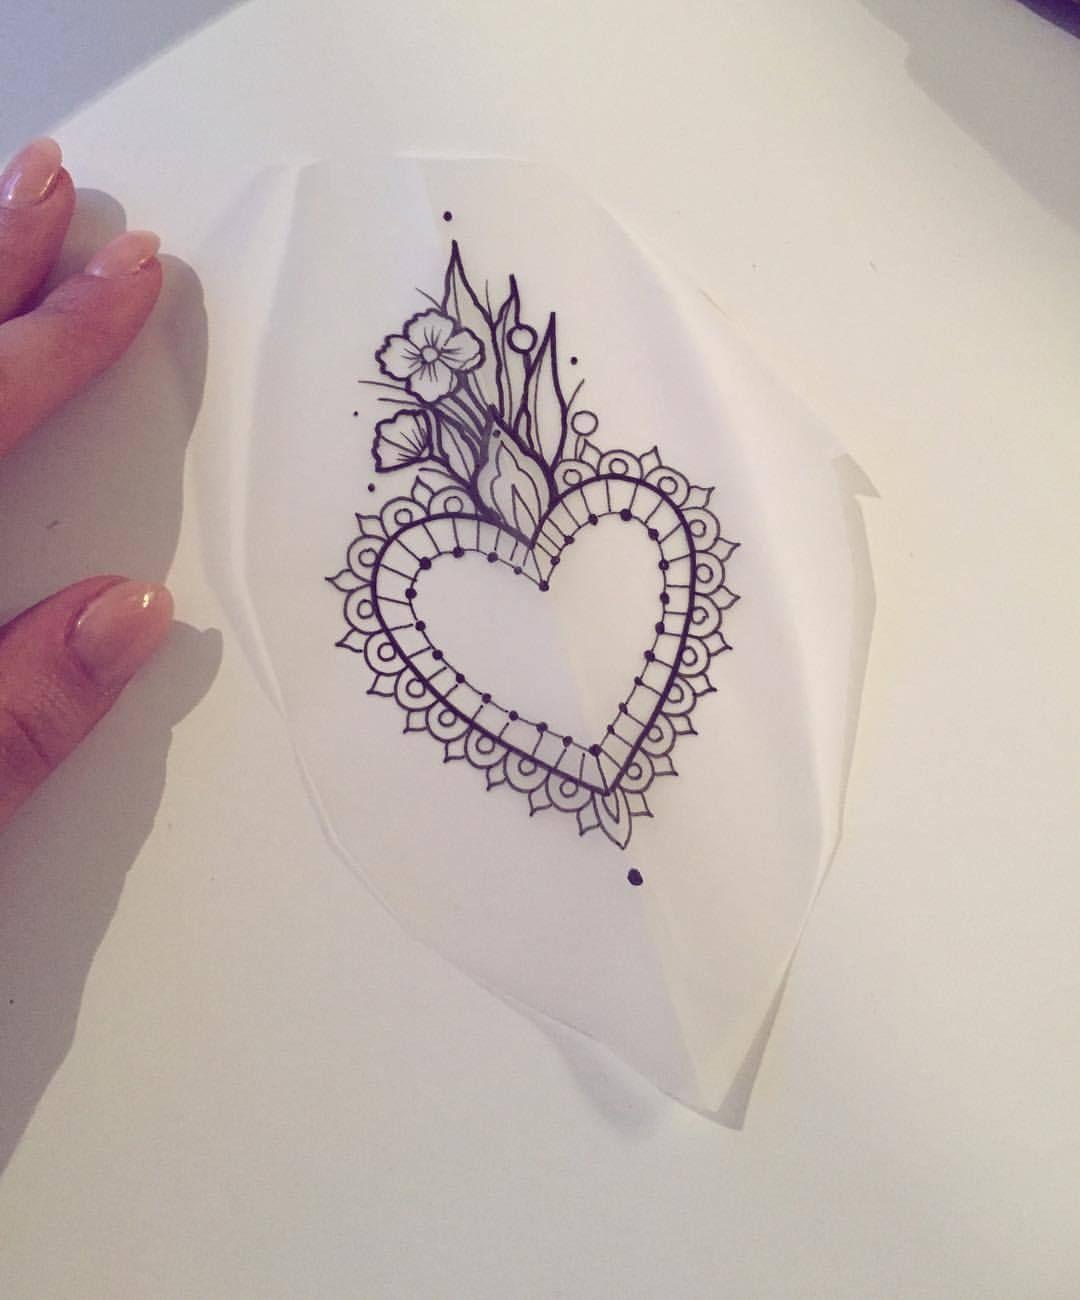 Photo of sacred heart tattoo design – Google Search #Design #Google #Heart #Sacred #Sear